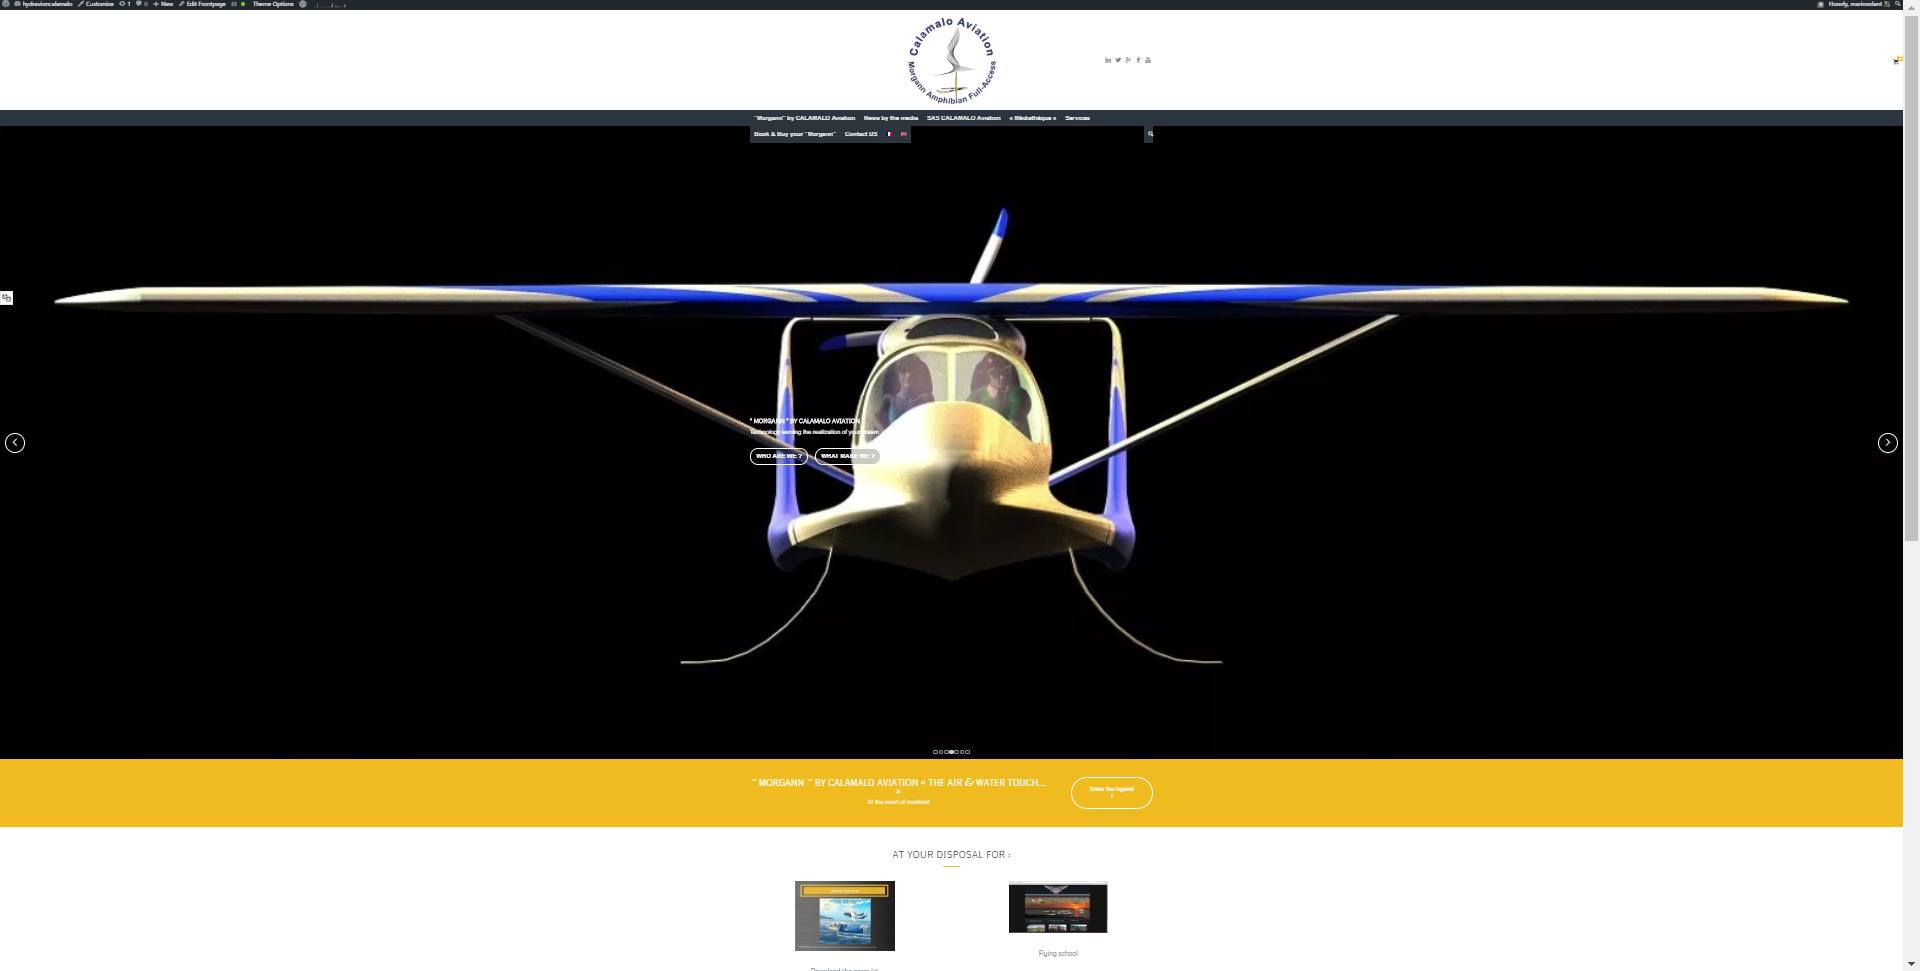 http://www.pilote-virtuel.com/img/gallery/1535418403.jpg